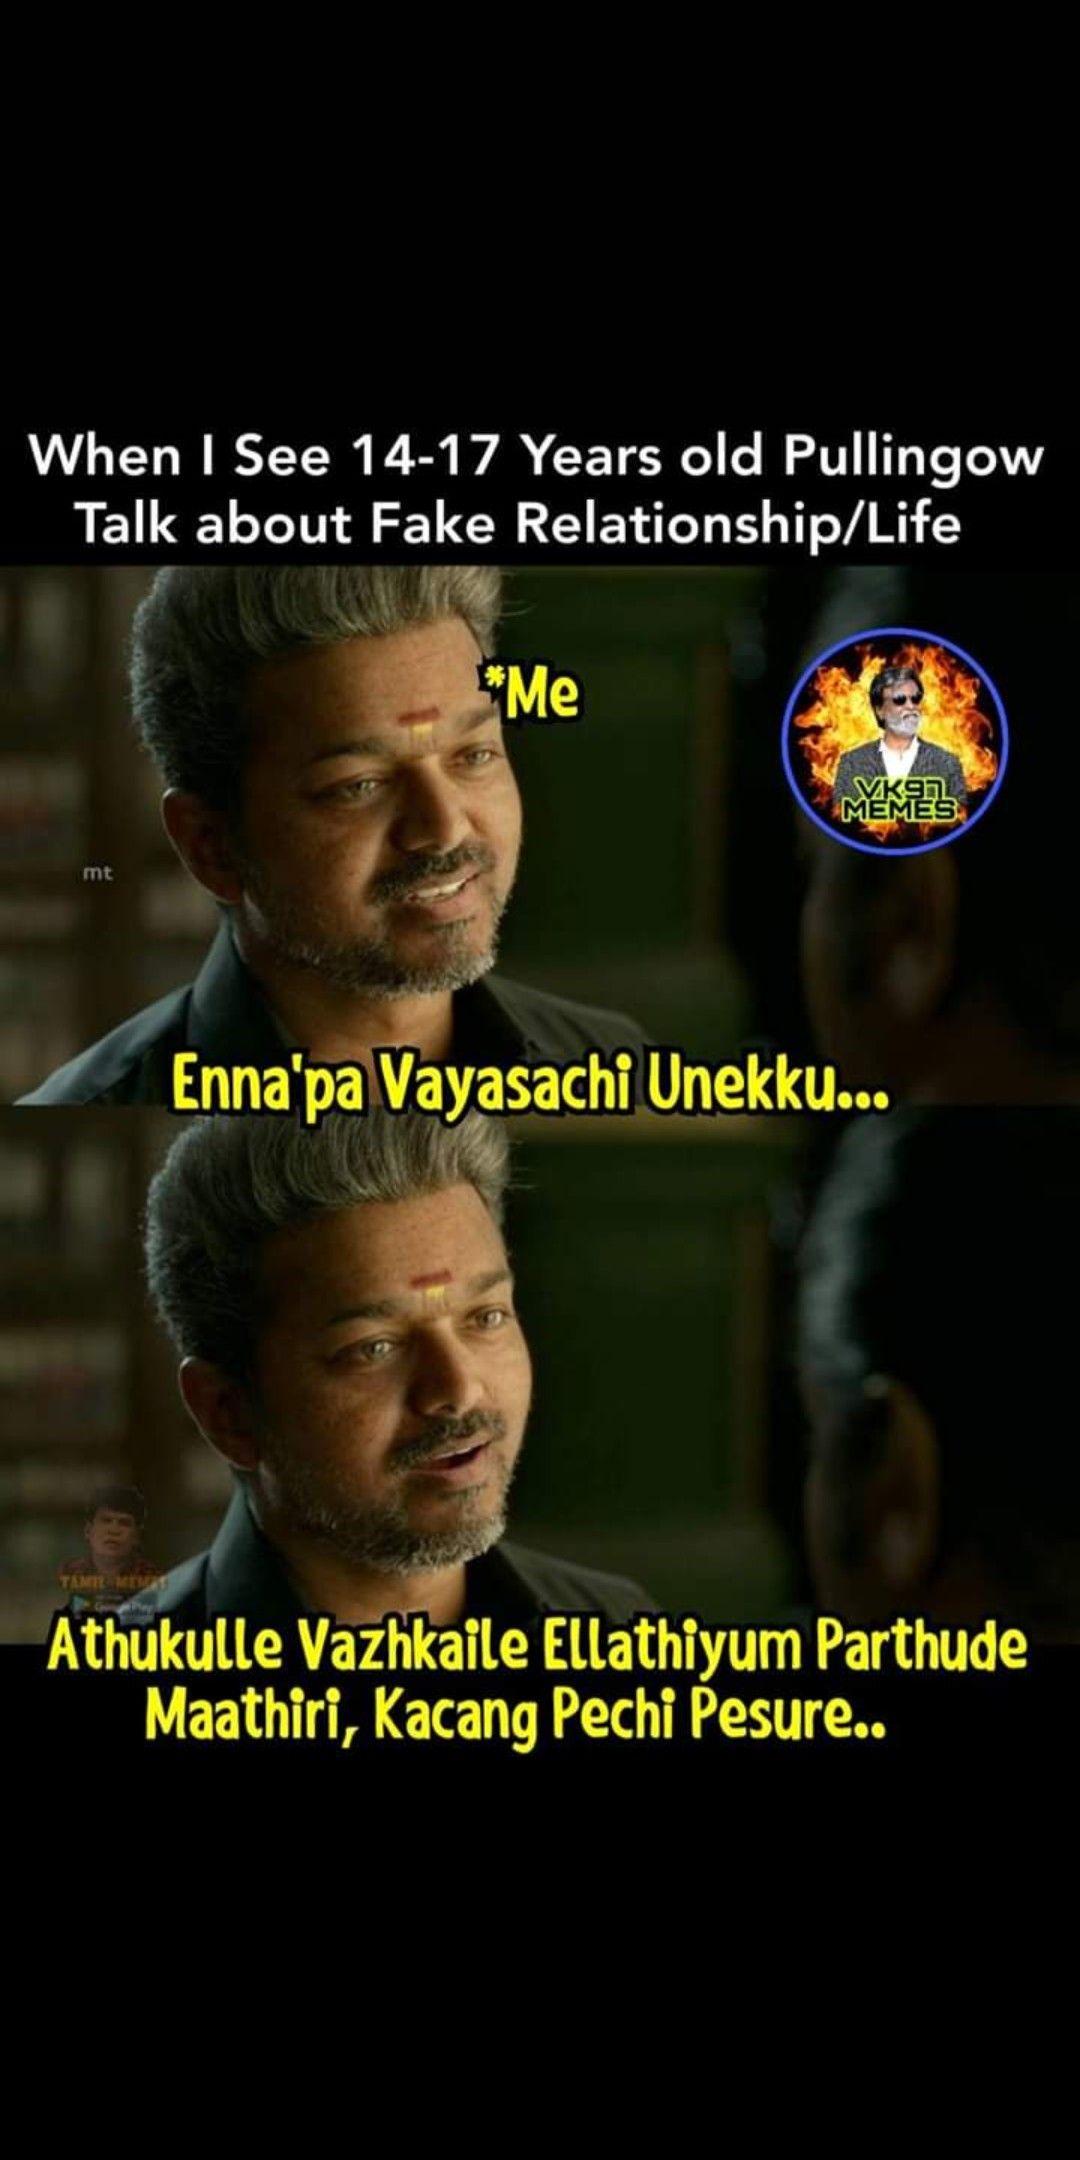 Pin By Shaaa On Tamil Funny Memes Tamil Funny Memes Fake Relationship Memes